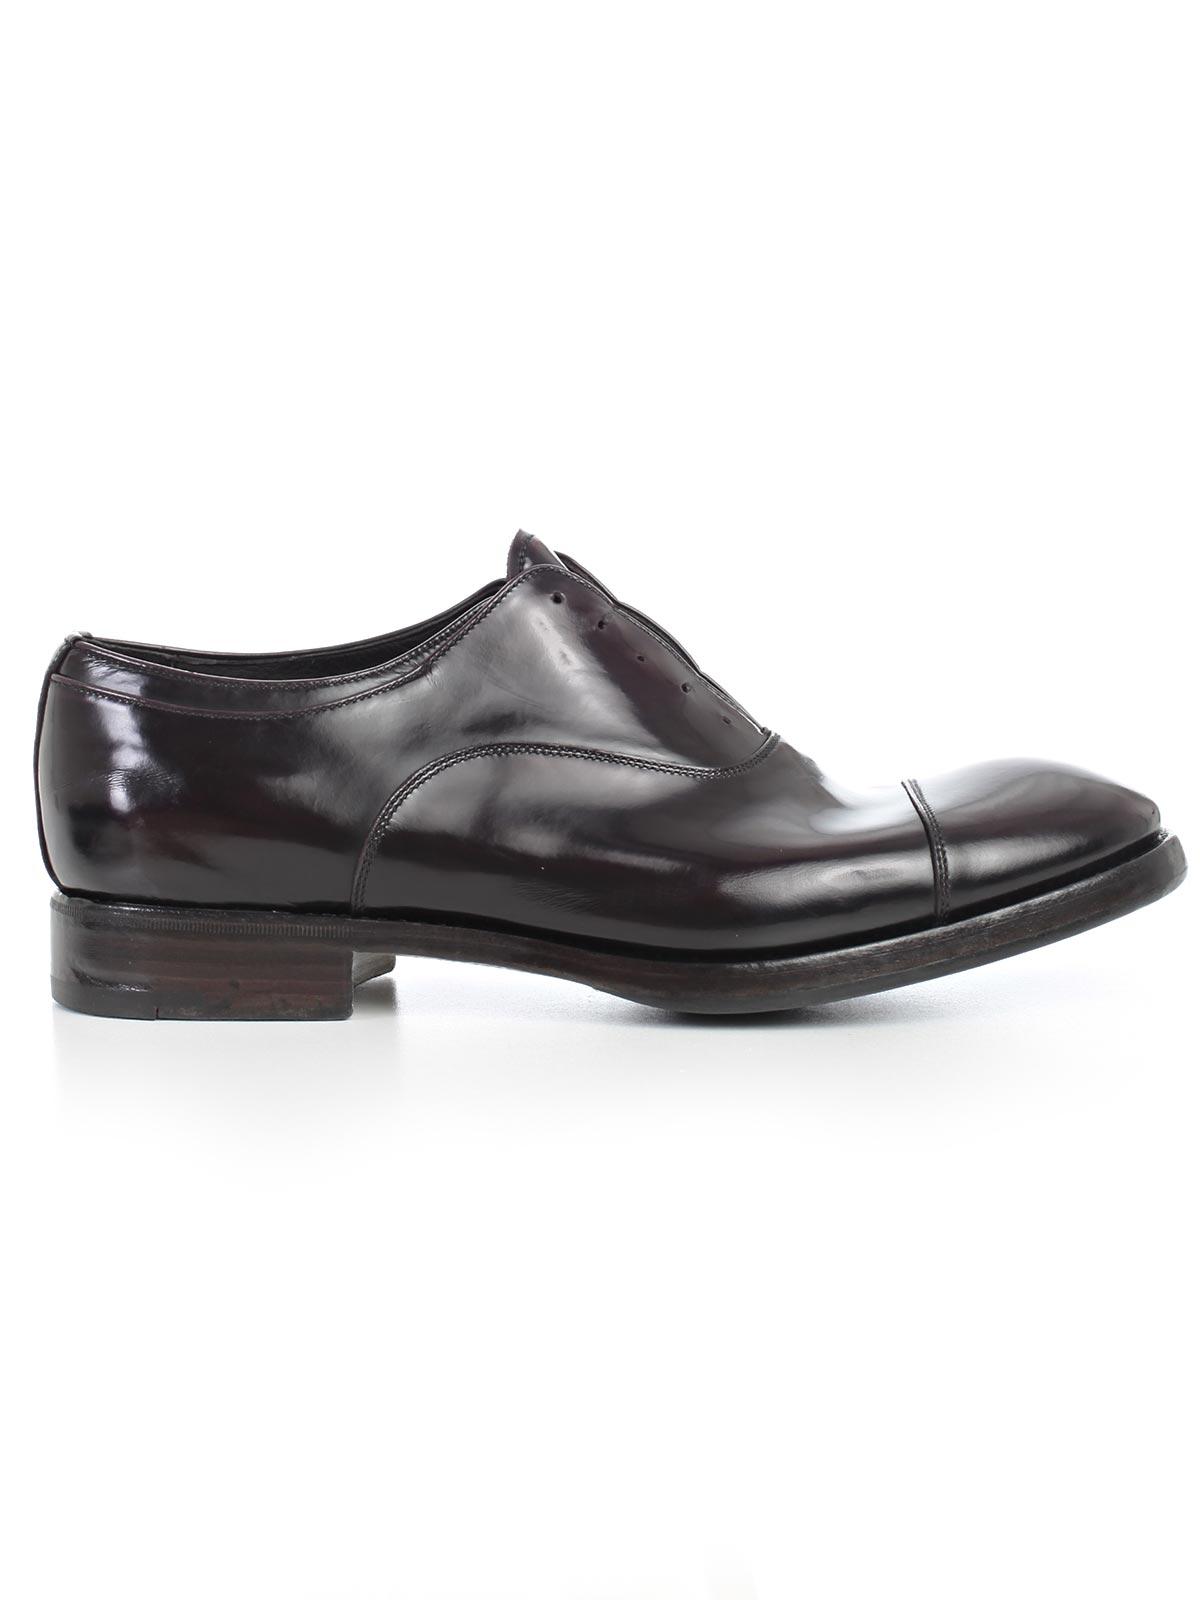 Picture of PREMIATA FOOTWEAR SCARPA STRINGATA CLASSICA